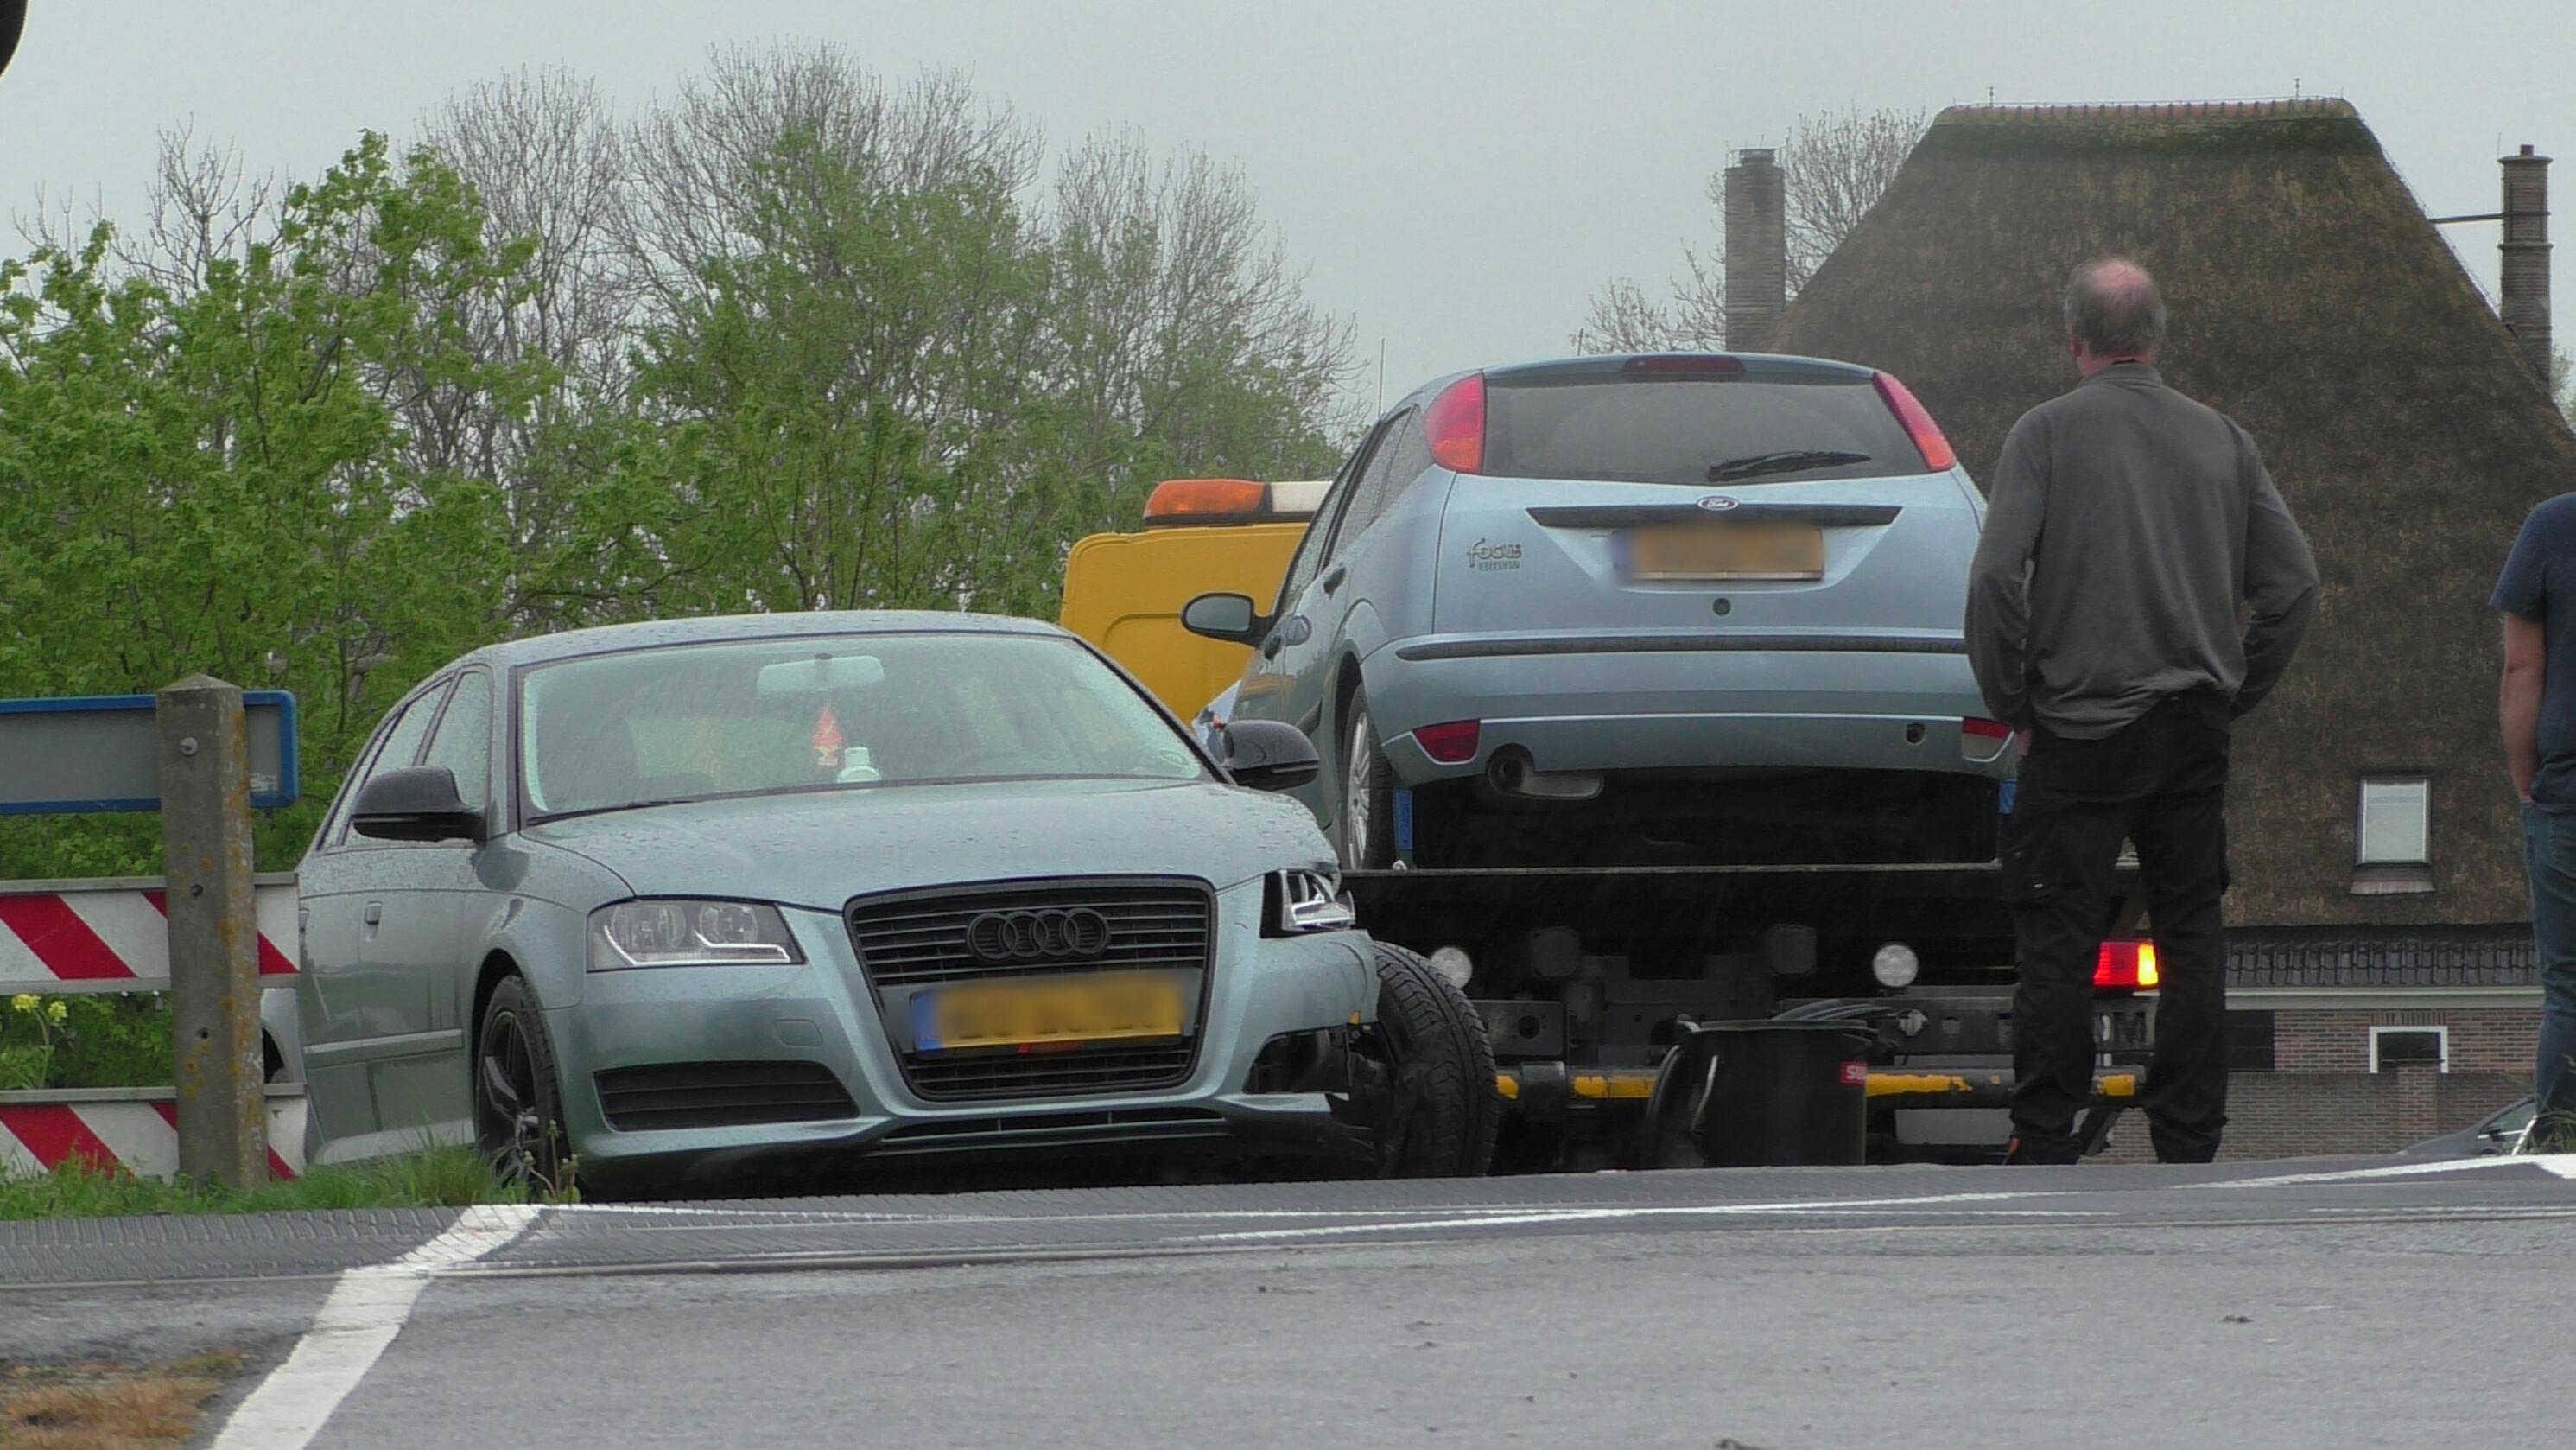 Treinverkeer tussen Heerhugowaard en Obdam stilgelegd door botsing auto's